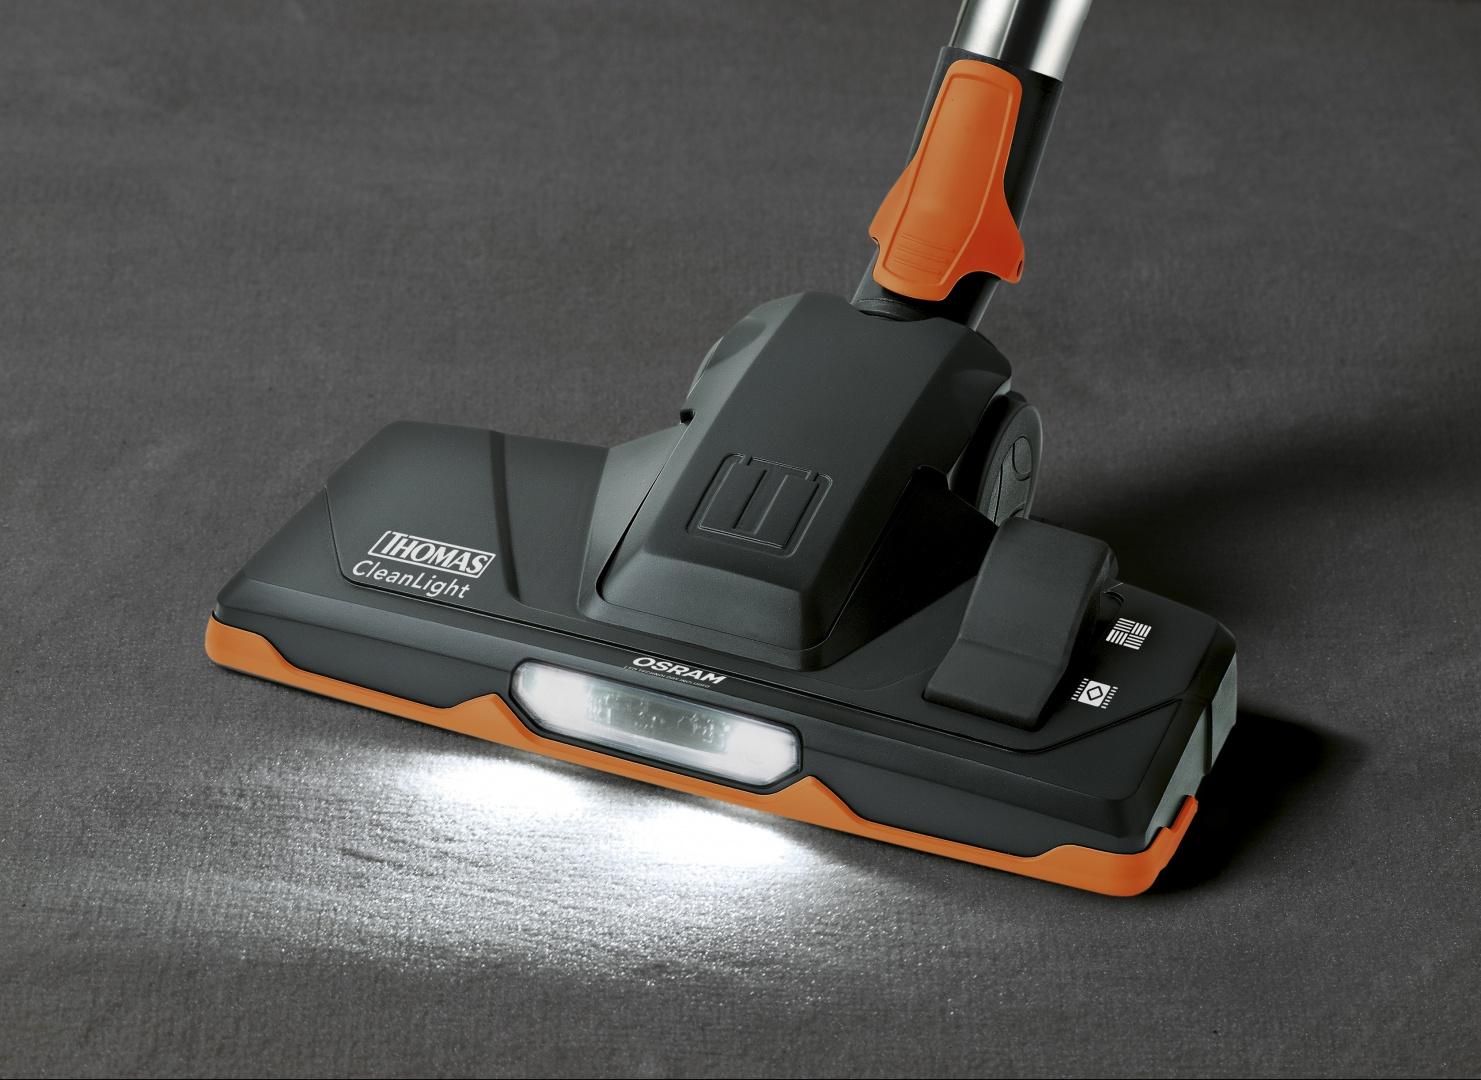 Szczotka parkiet-dywan CleanLight, z oświetleniem LED, crooSer animal plus i crooSer parquet plus . Fot. Thomas.